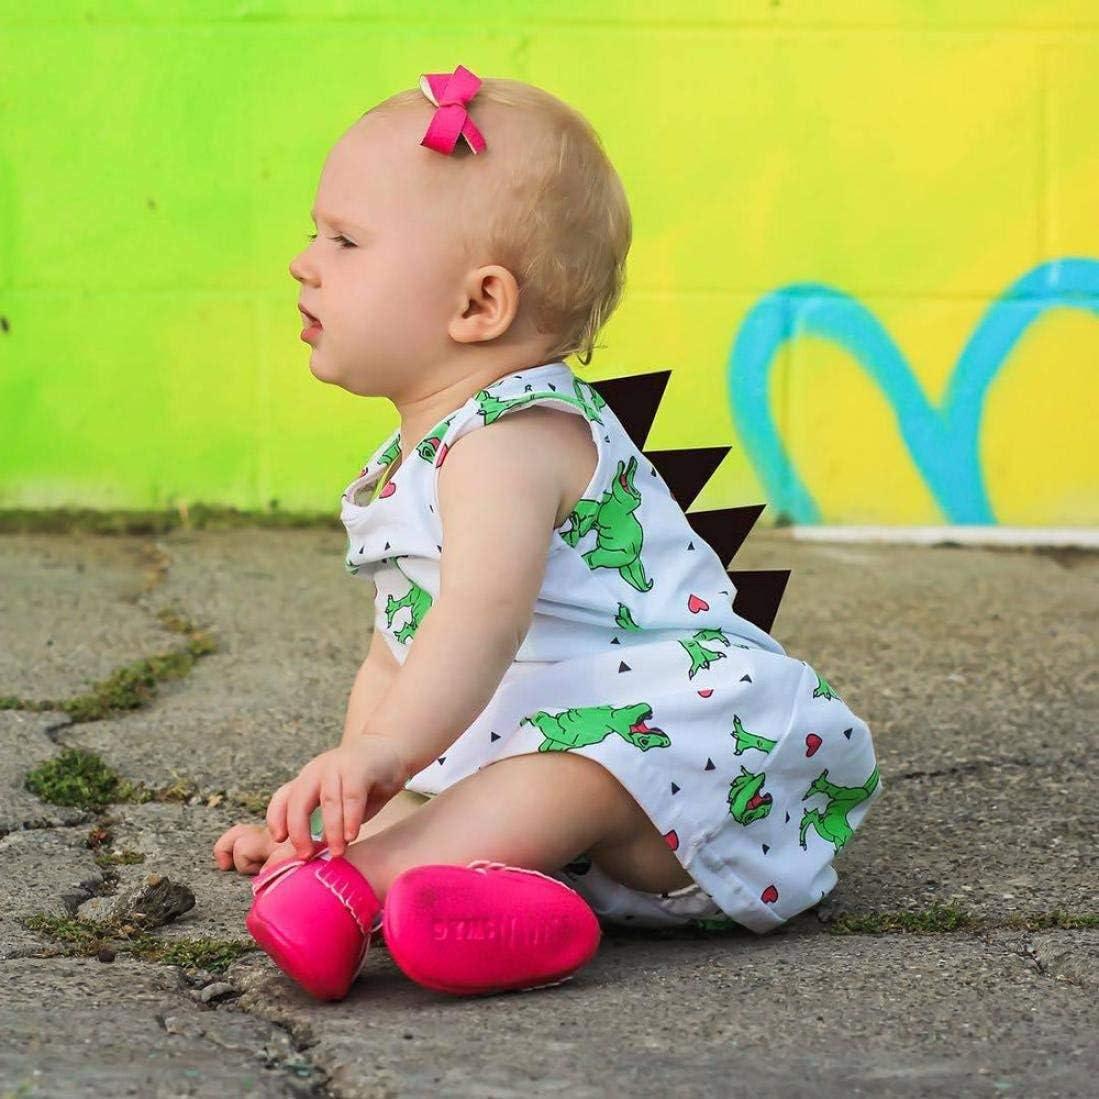 Baby Toddler Girl Cartoon Dinosaur Striped Print 3D Dorsal Fin Dress Set 1-5 Years Old Xman Eletina Baby Girl Dress